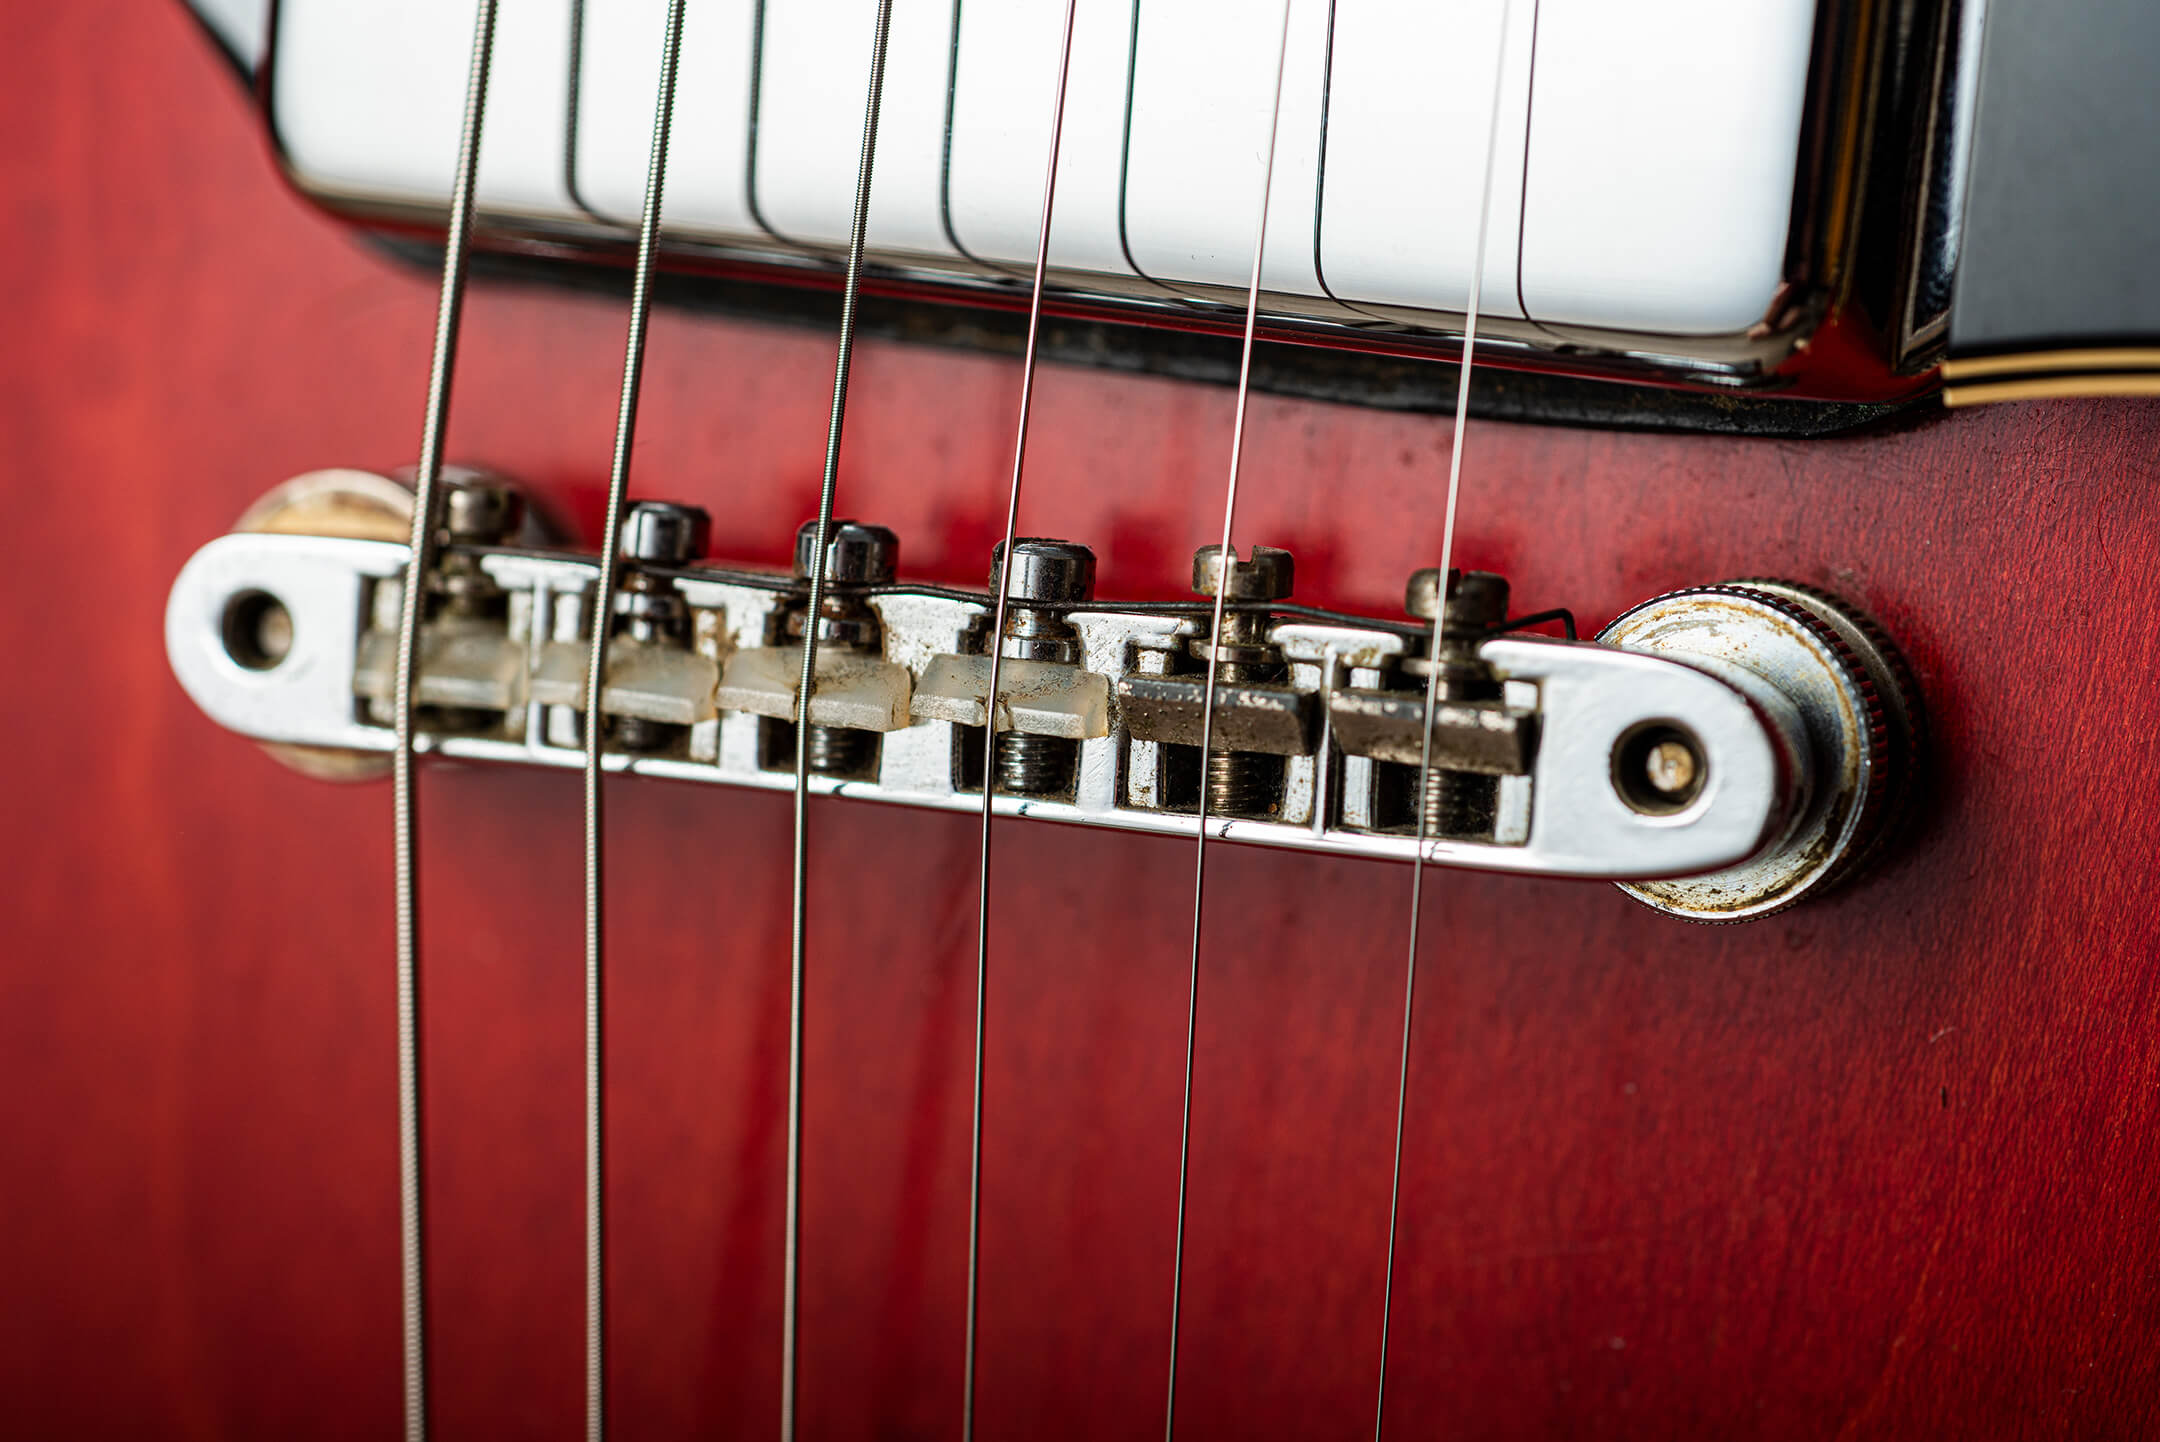 Vintage Bench Test: Gibson 1969 Es-330 'Long Neck' Bridge